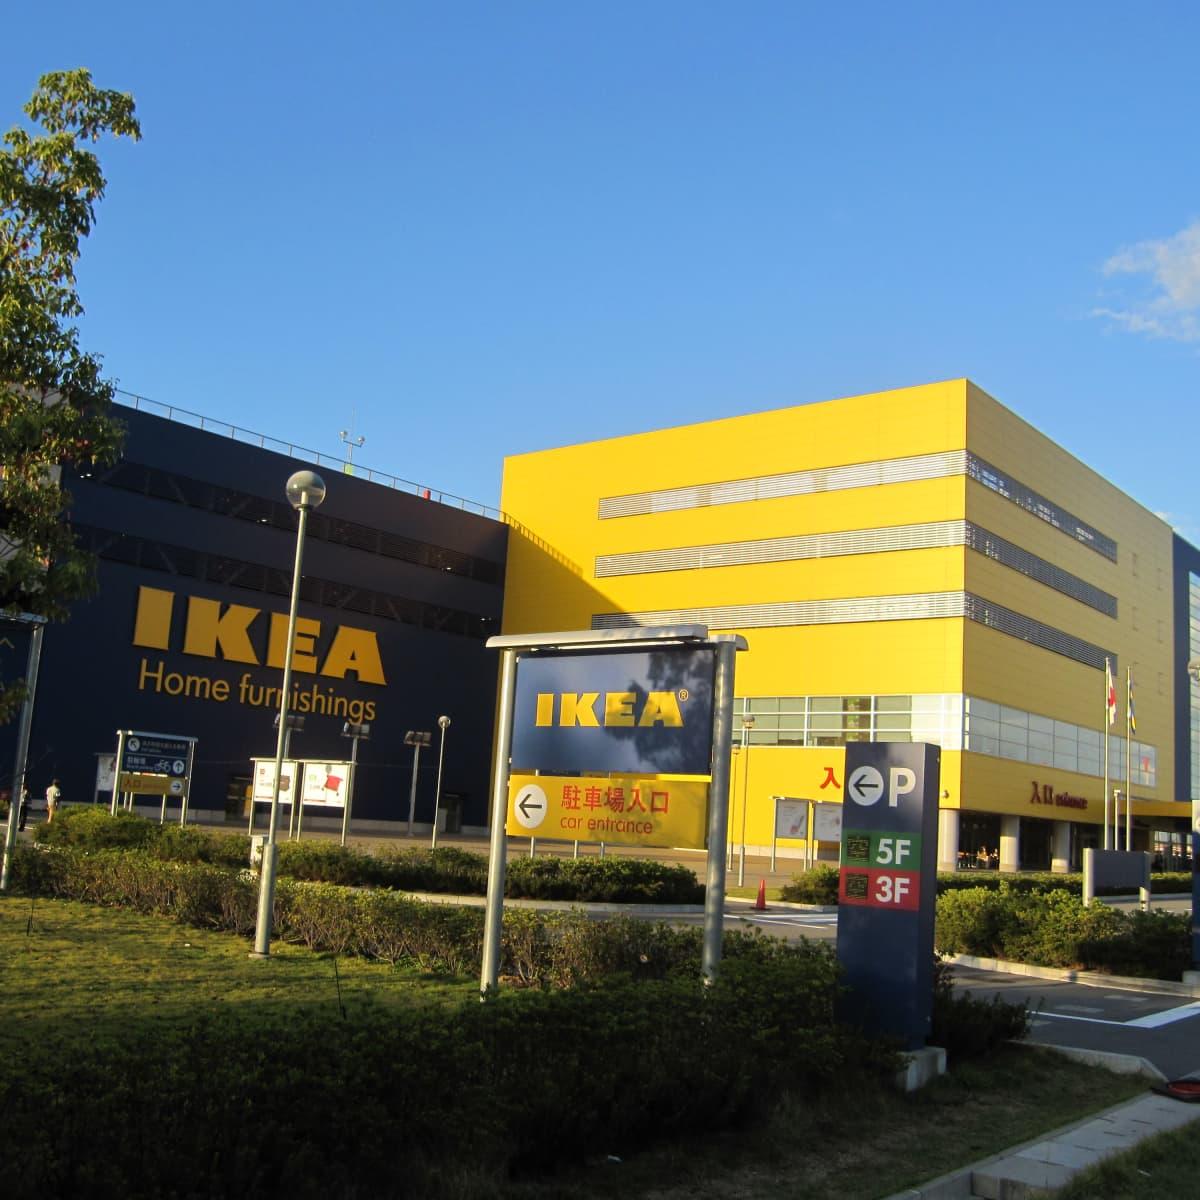 How To Buy An Ikea Bed Dengarden Home And Garden